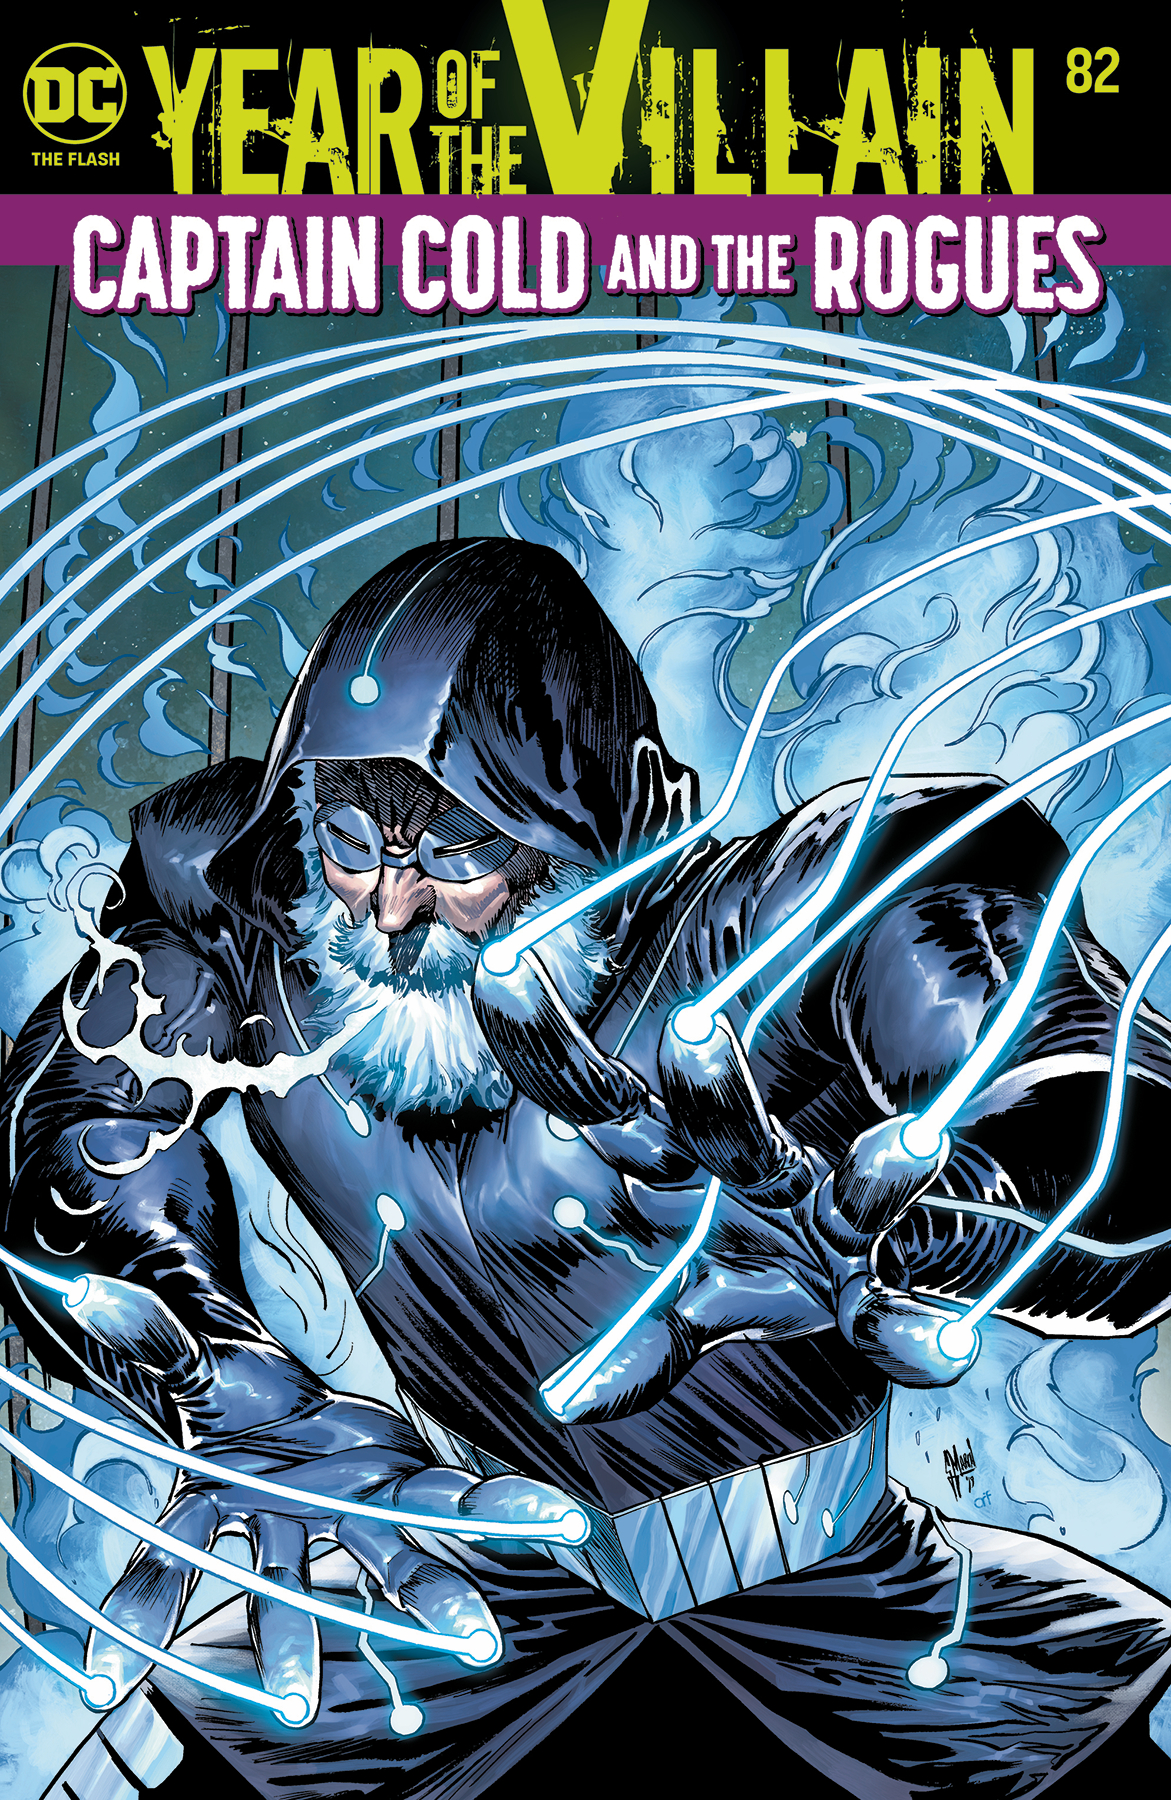 Flash #82 Yotv (STL134401)